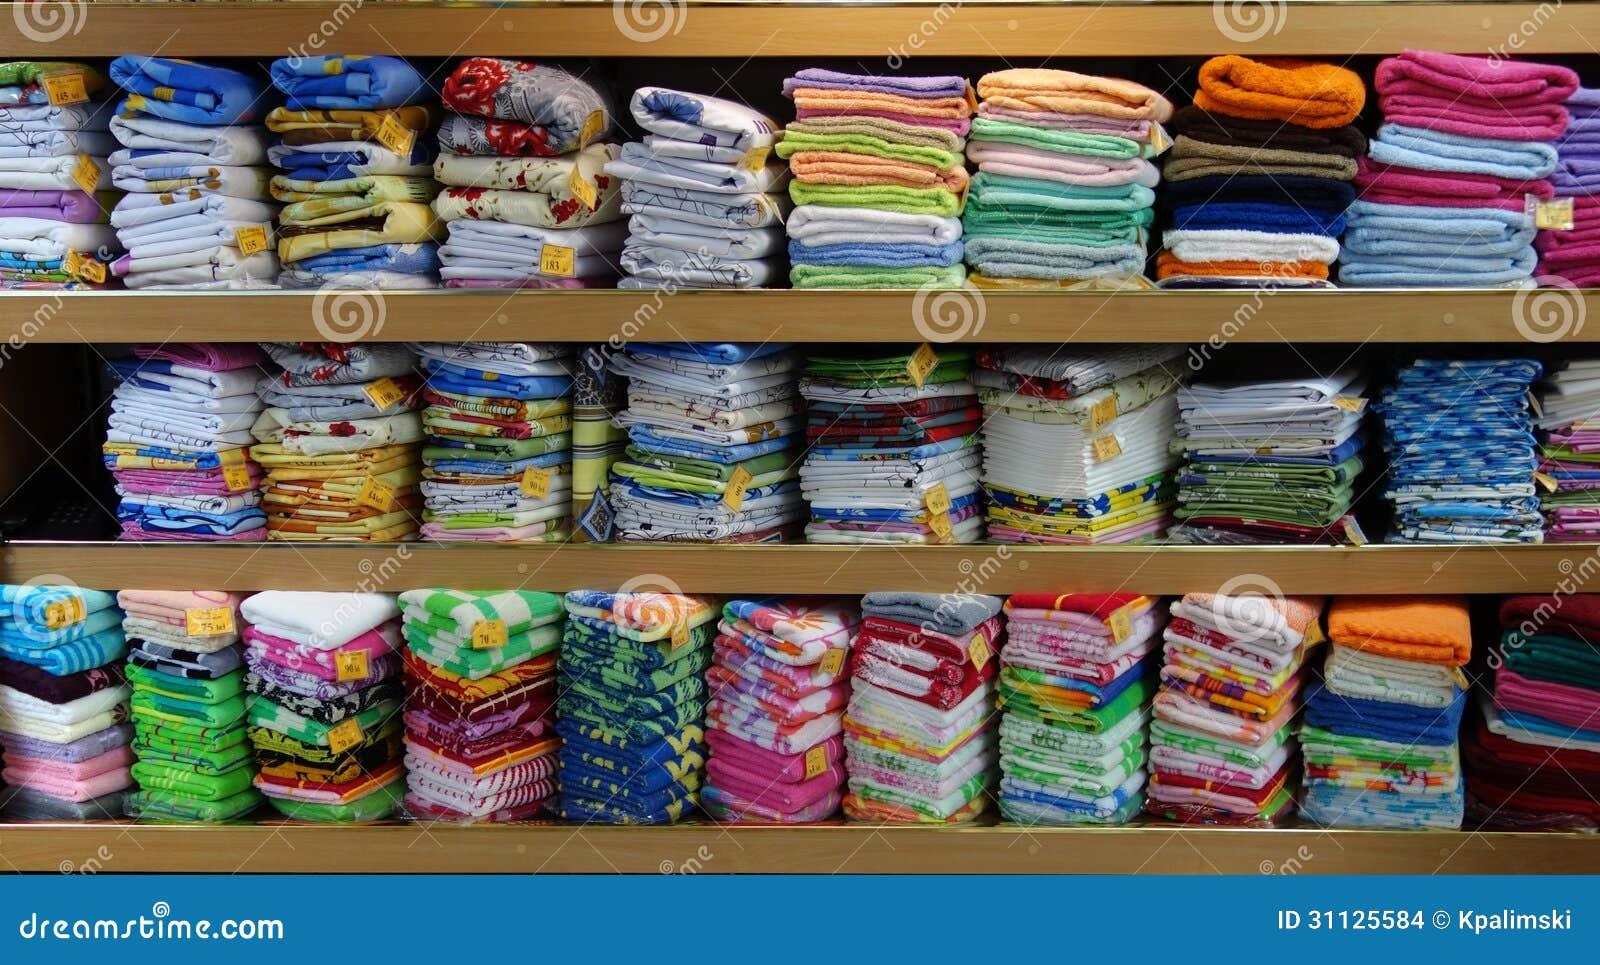 stores - Cheap Designer Clothes Stores | Hornsea Freeport